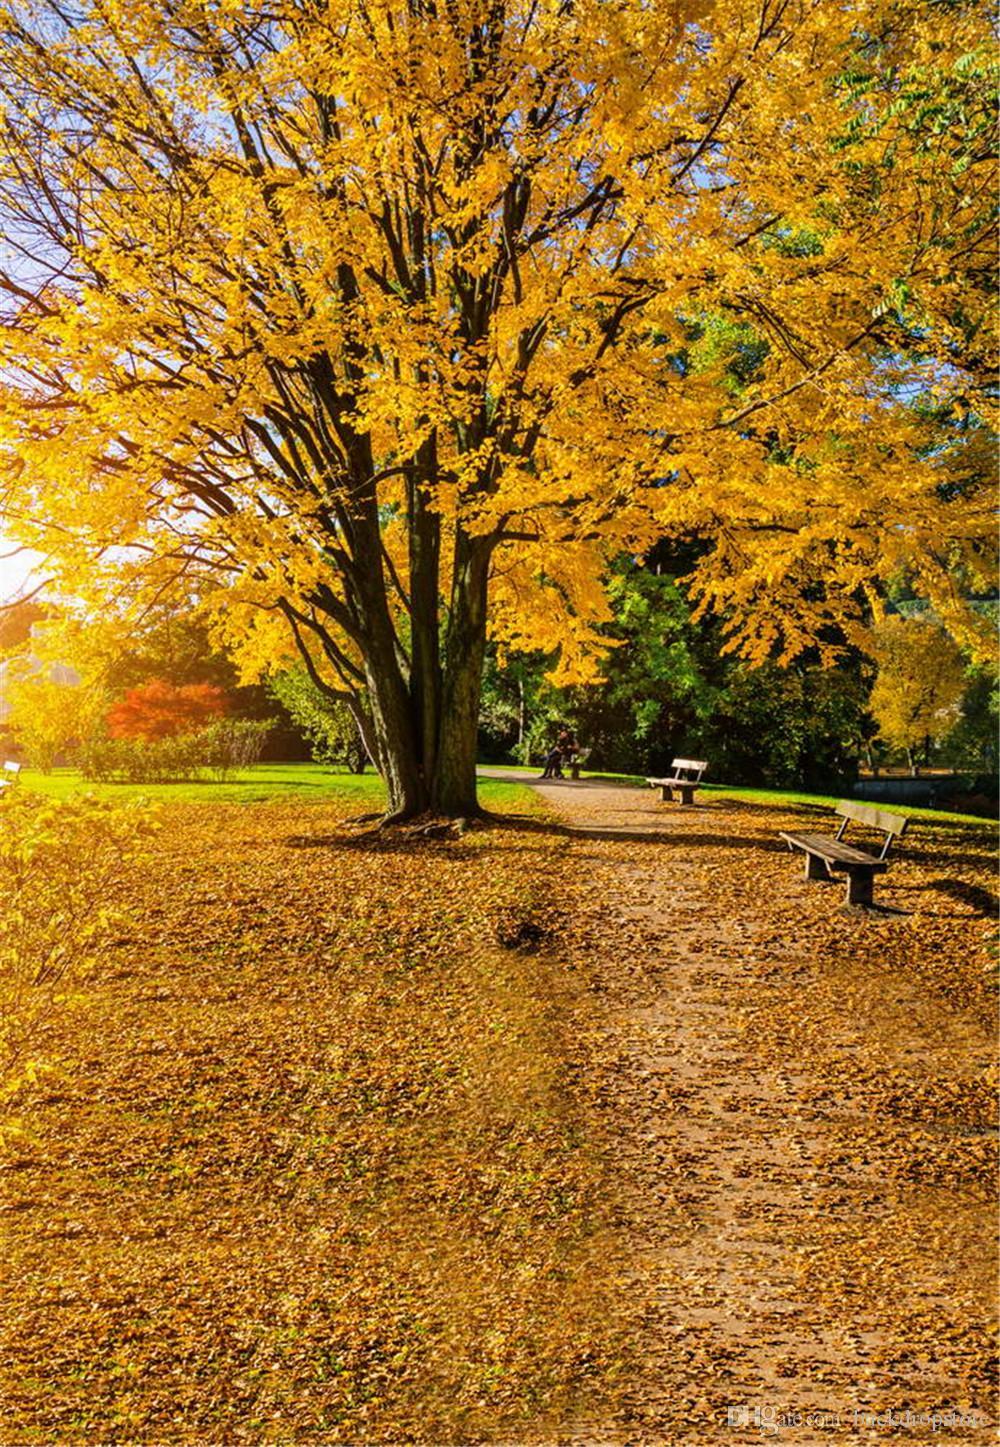 2019 park autumn scenic photography background yellow tree fallen